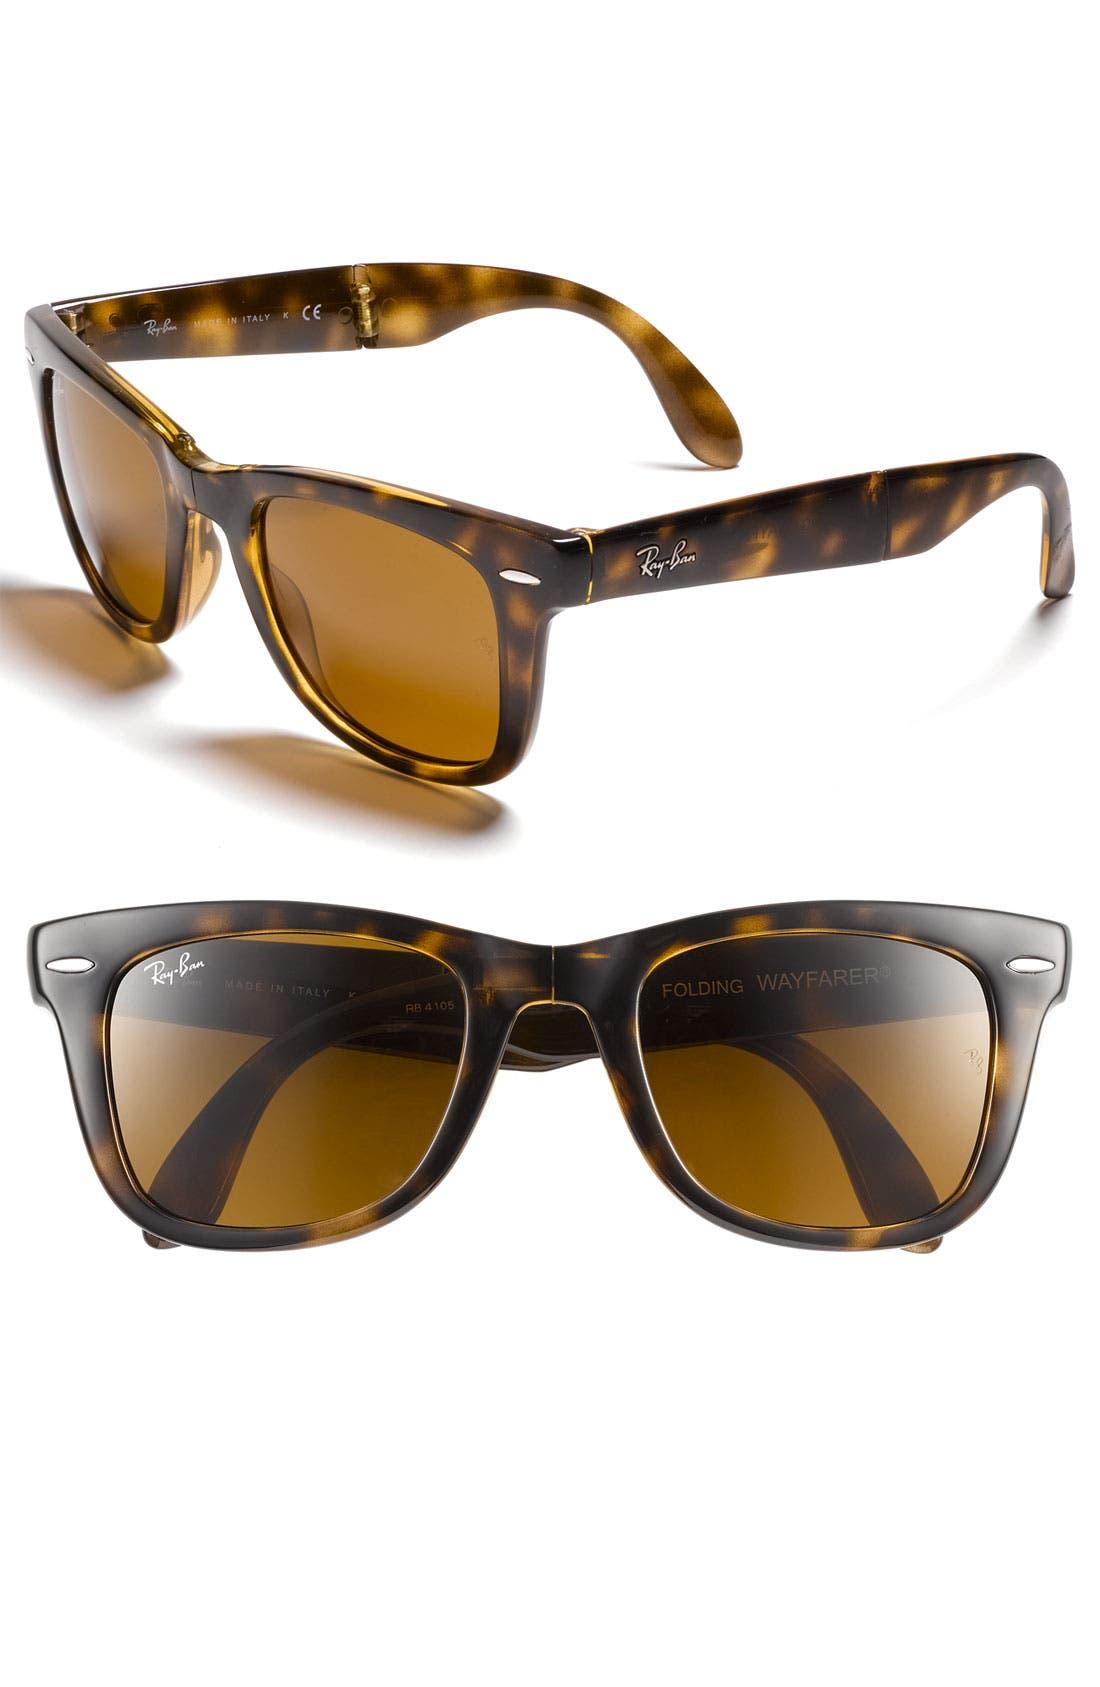 Main Image - Ray-Ban Standard 50mm Folding Wayfarer Sunglasses